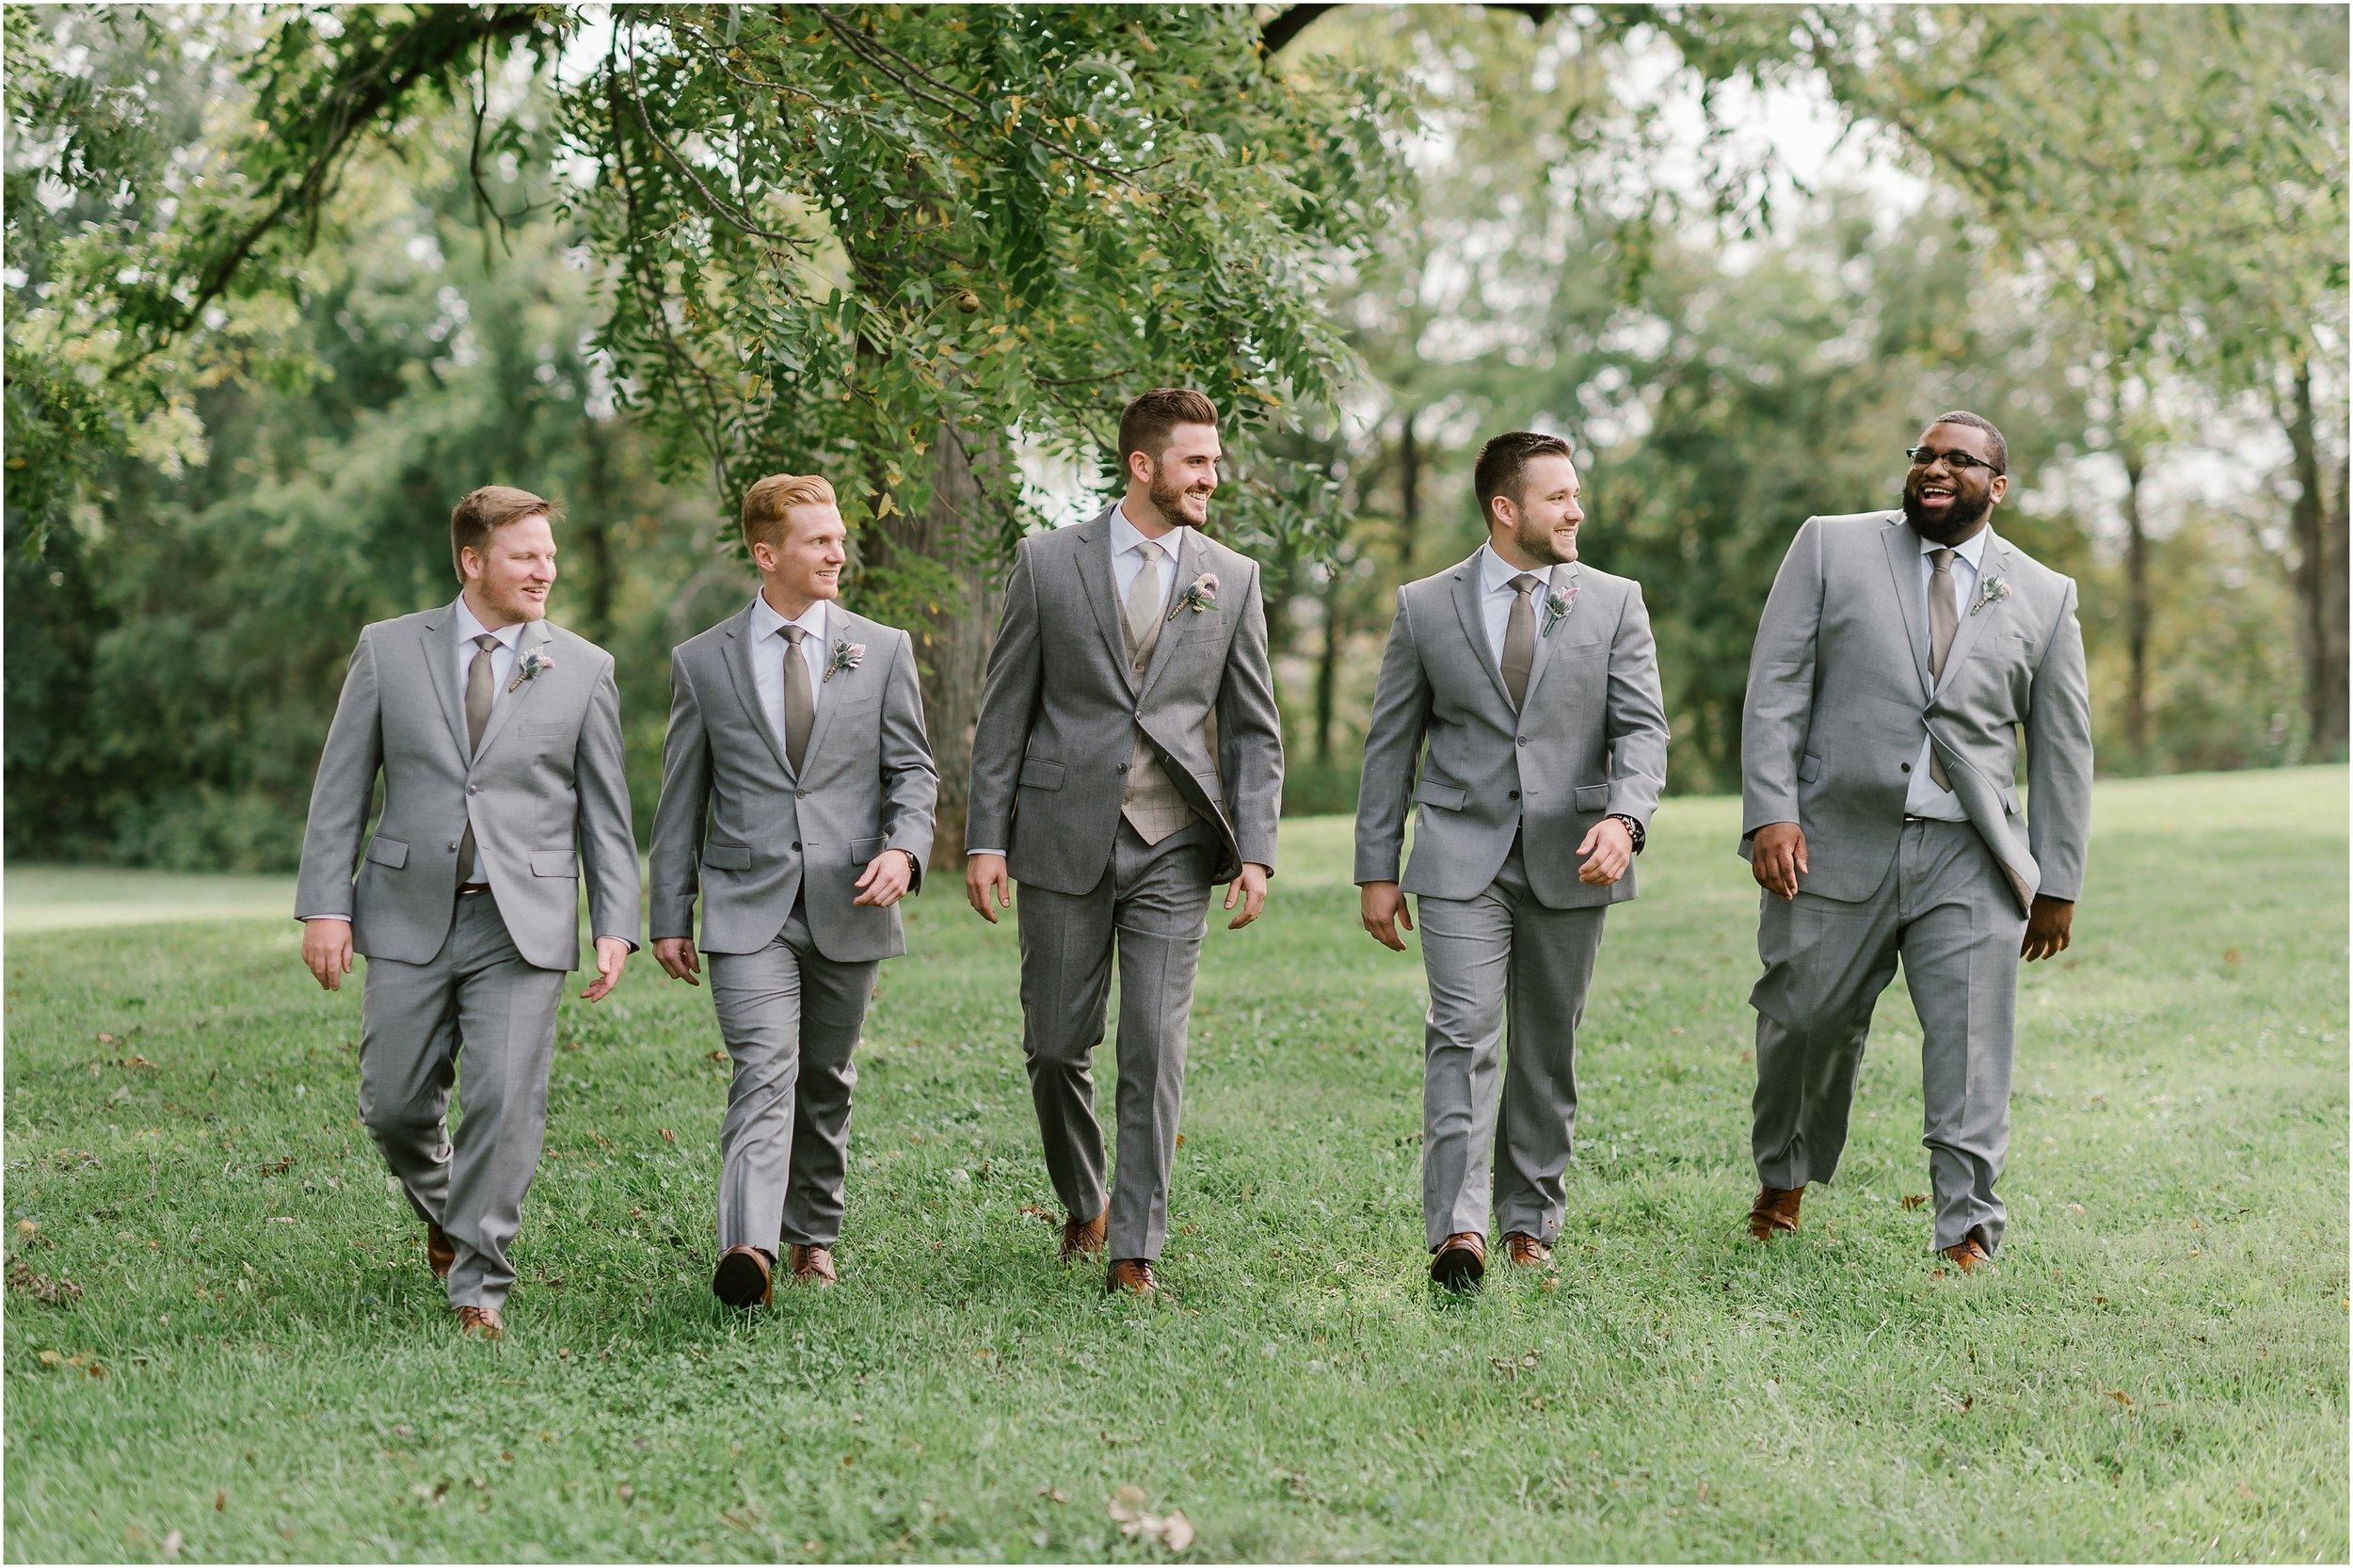 Rebecca_Shehorn_Photography_Indianapolis_Wedding_Photographer_9260.jpg